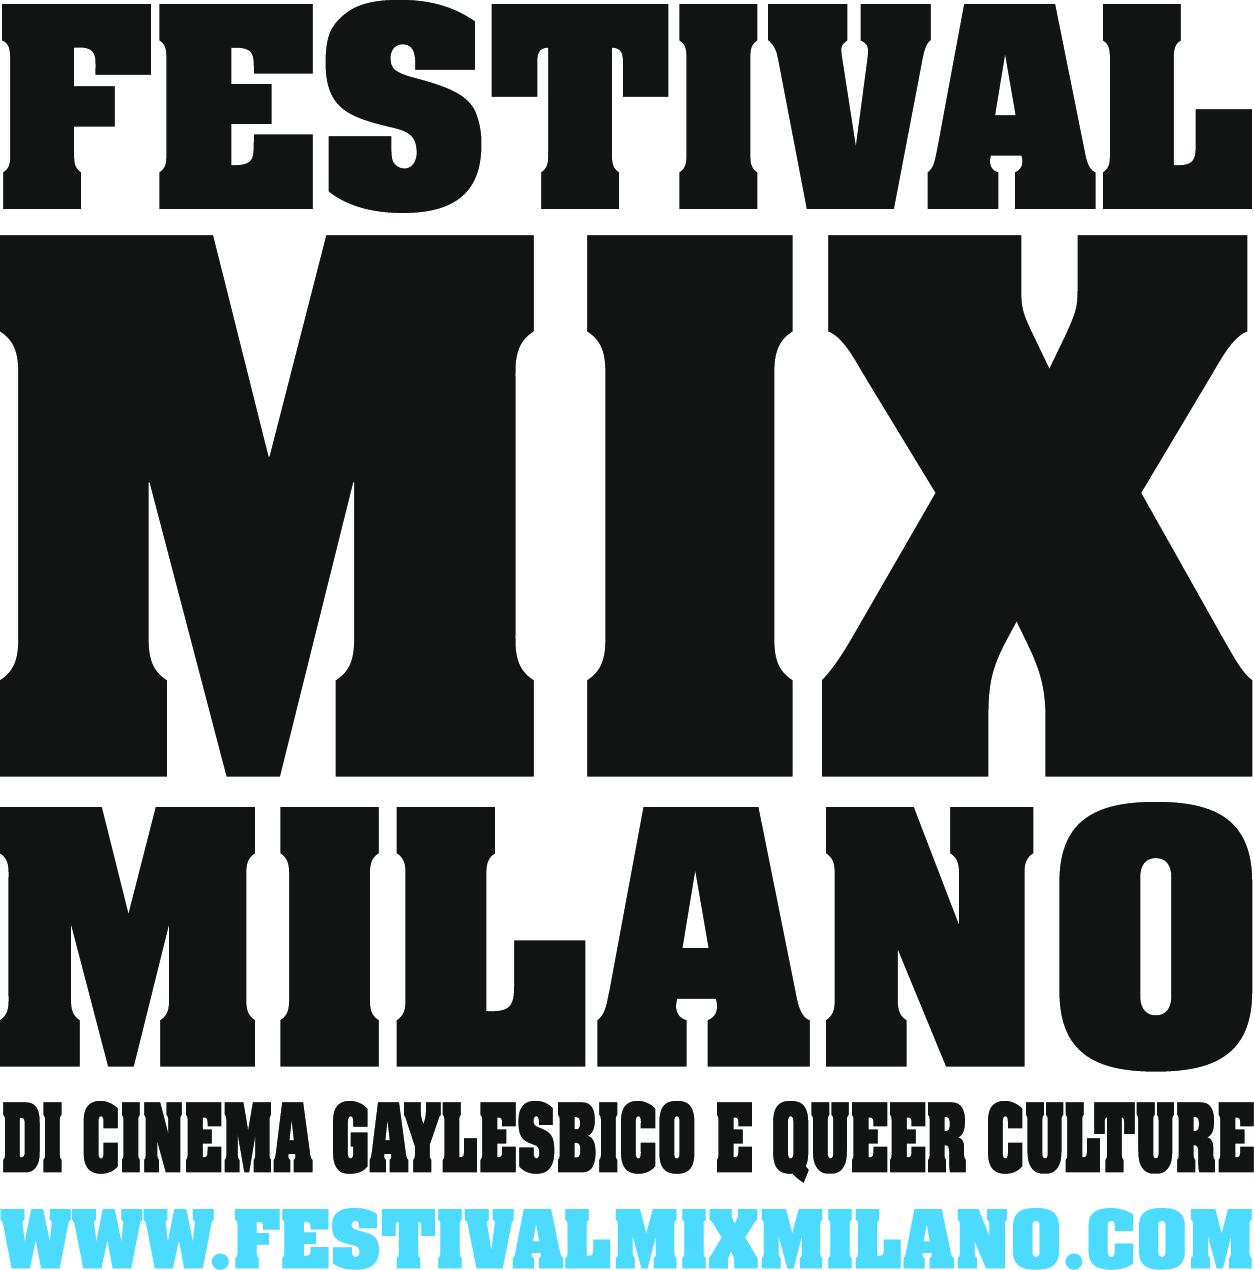 cinema gay lesbo milano